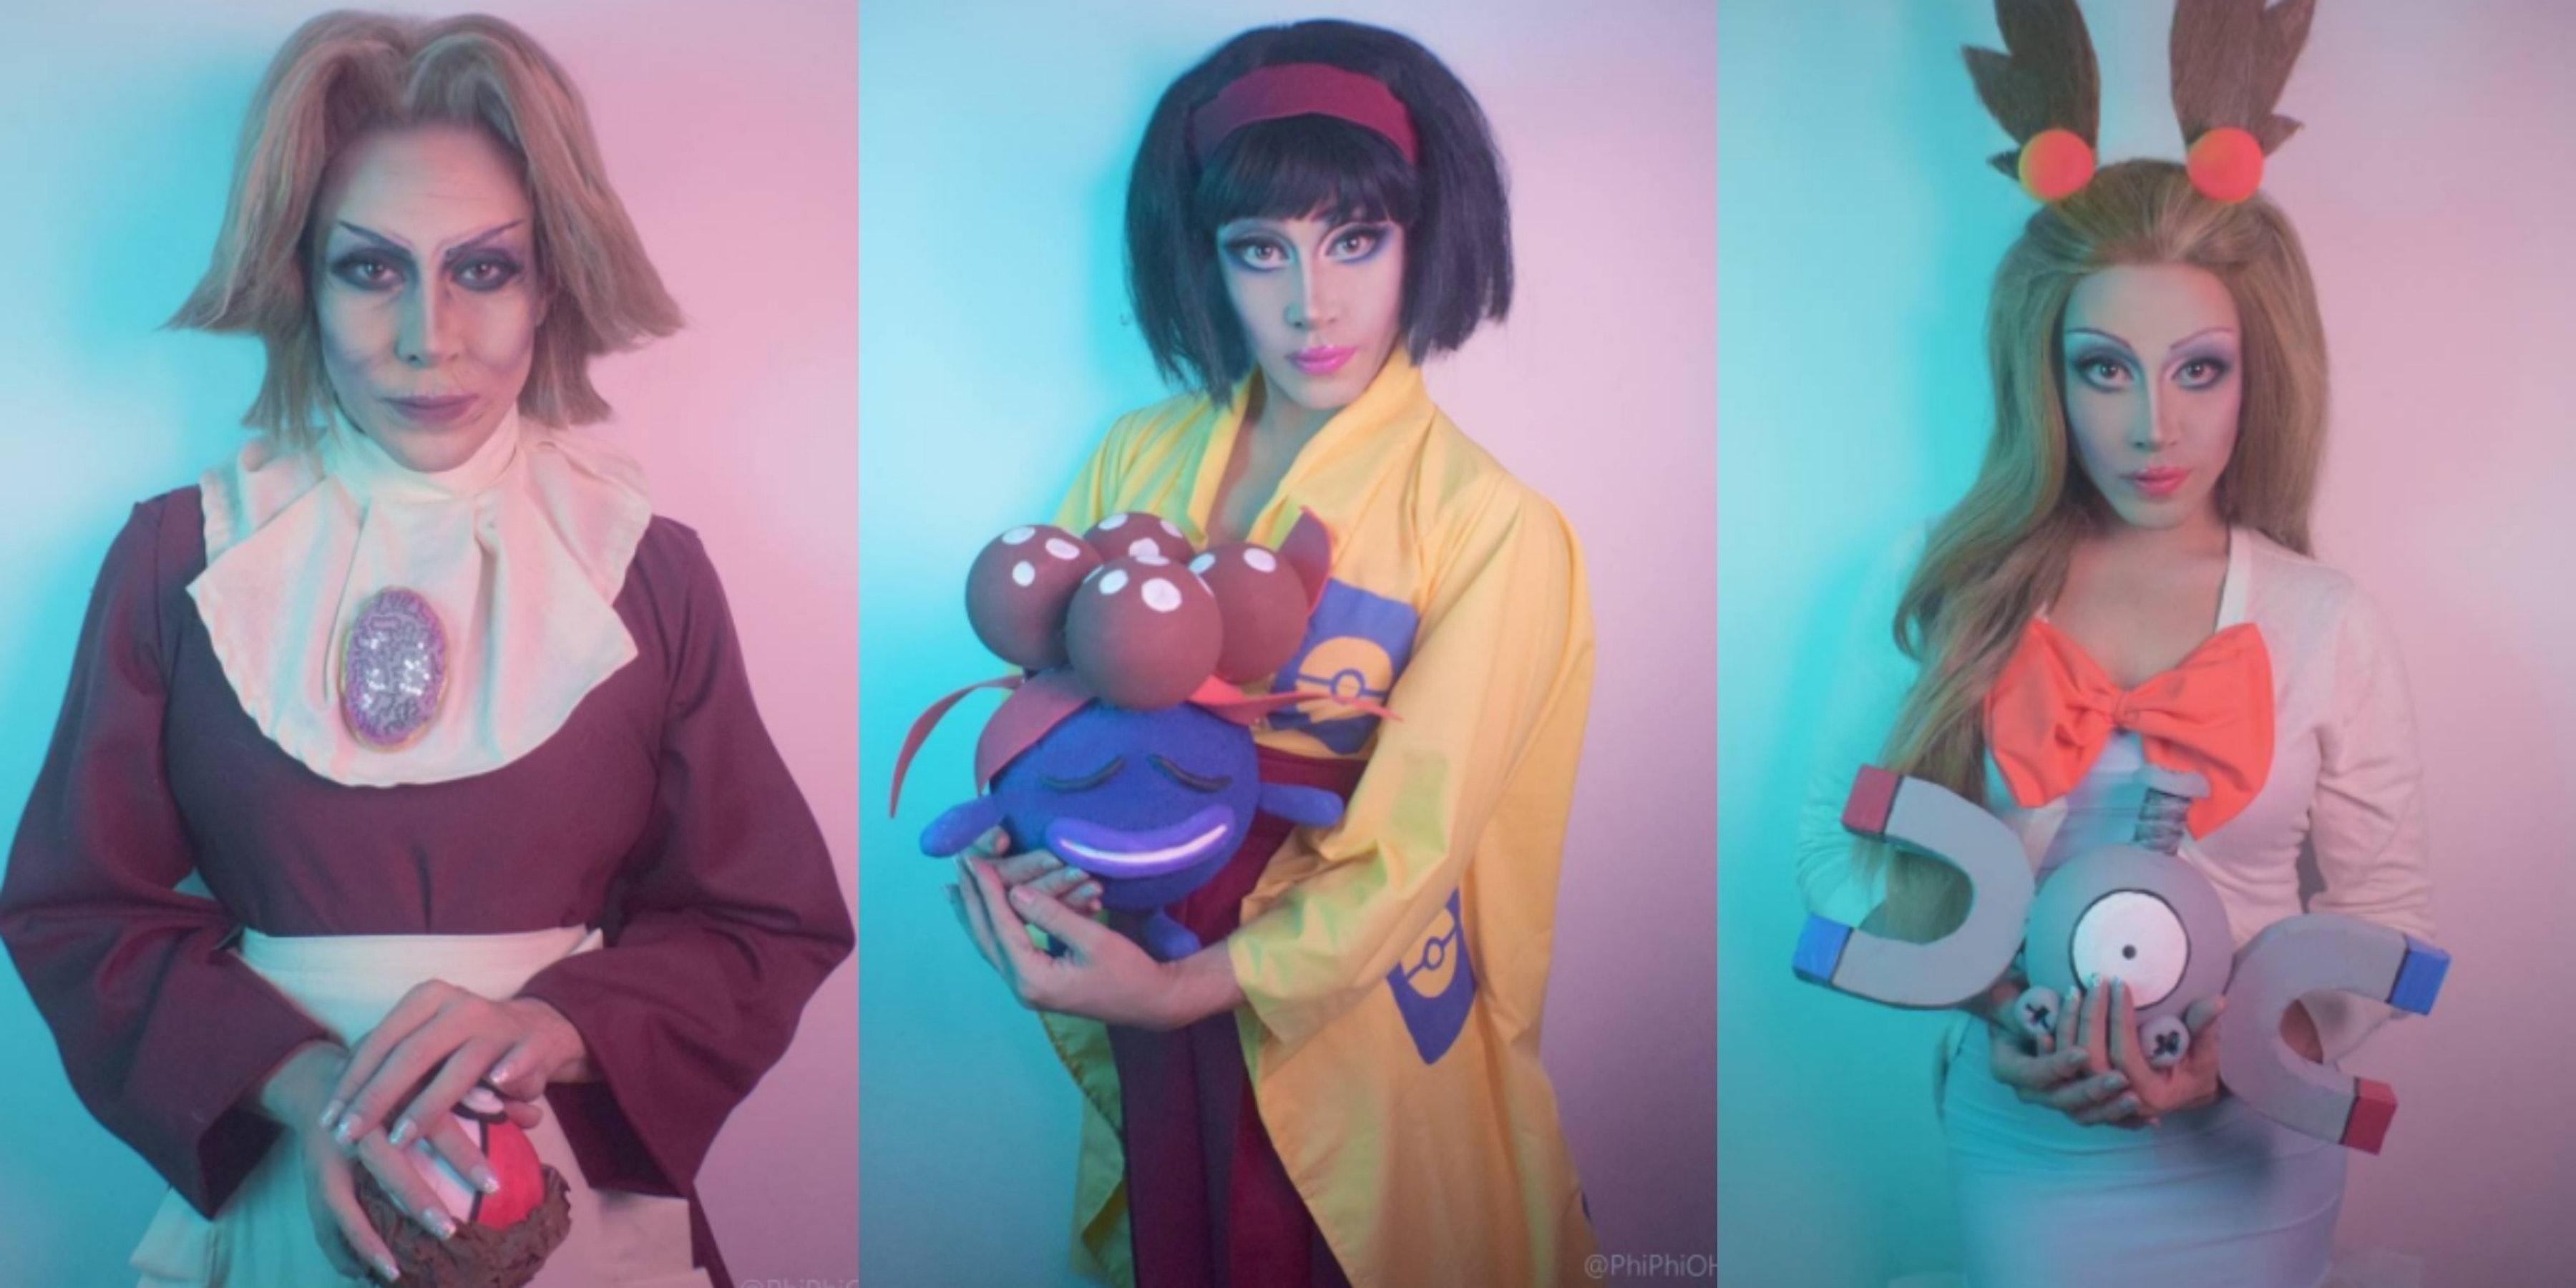 Phi Phi as Agatha, Erika, and Jasmine from 'Pokémon.'